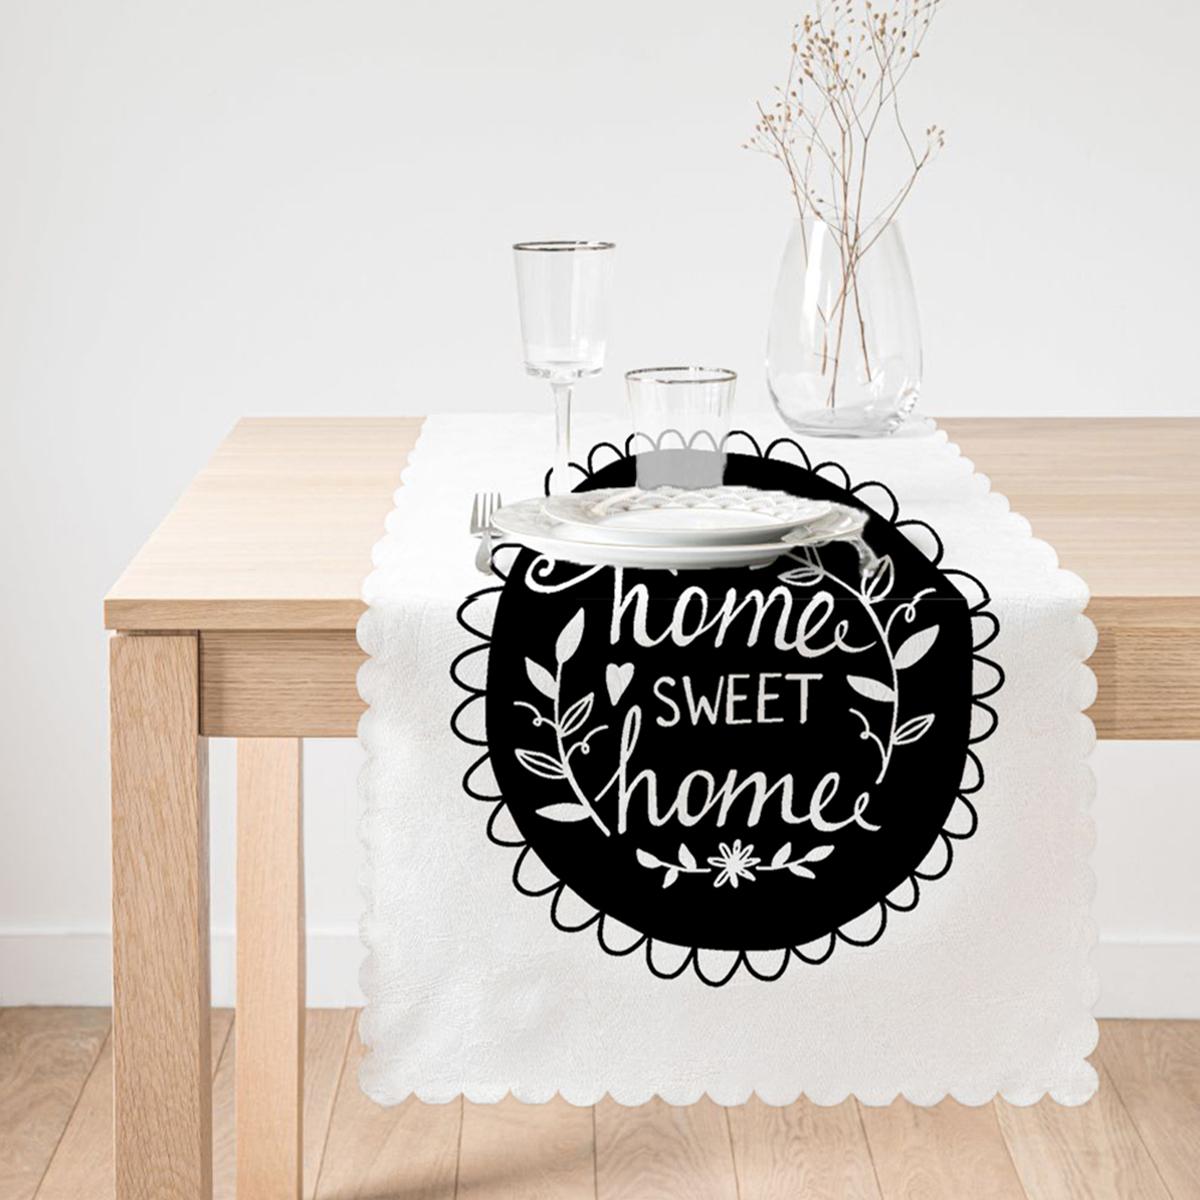 Home Sweet Home Tasarımlı Dekoratif Runner Realhomes